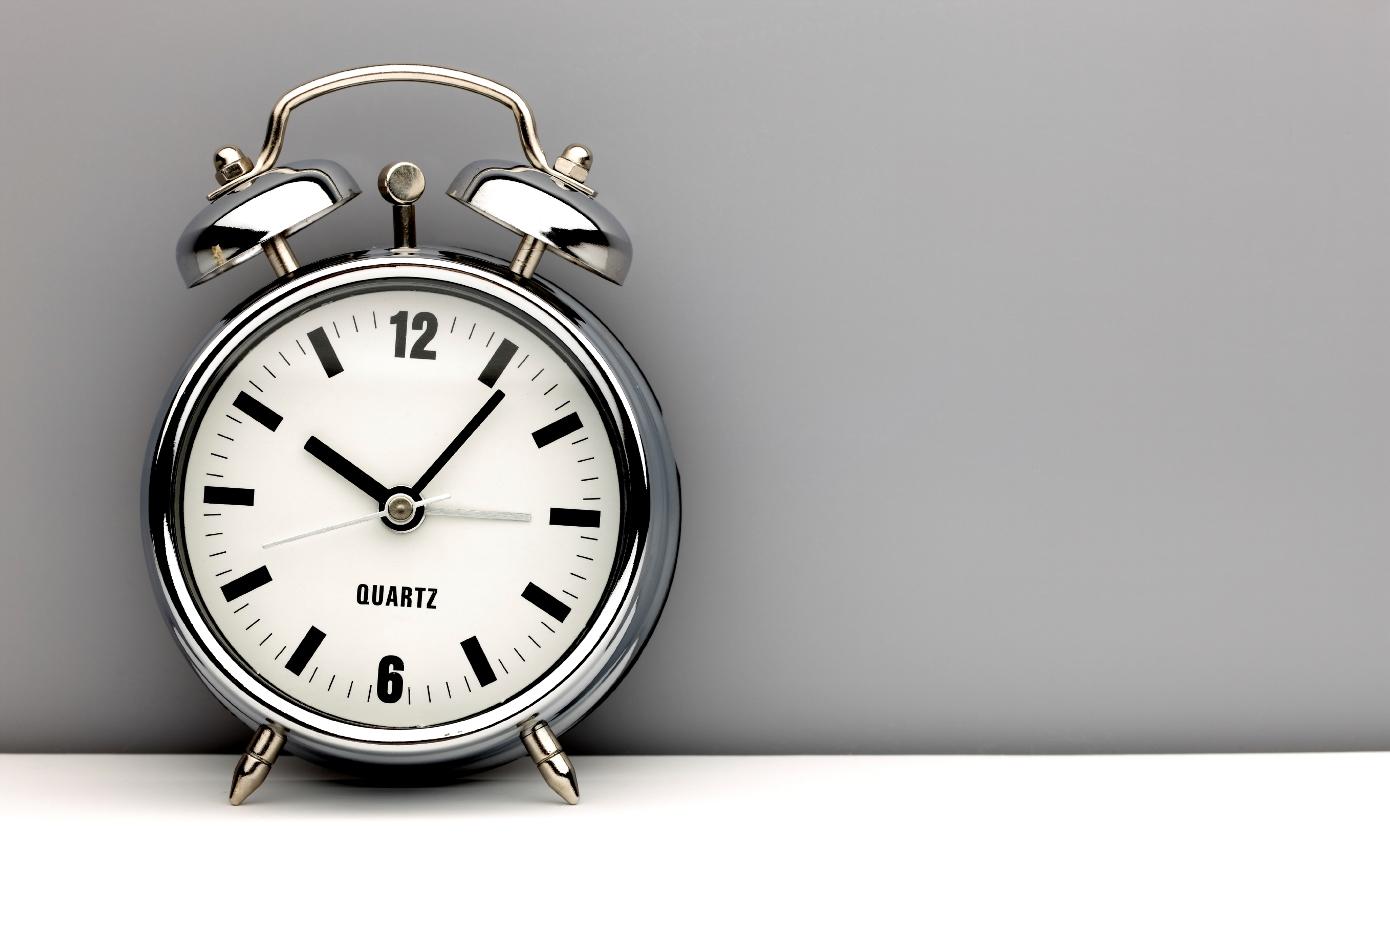 16 amazing productivity tips for university students